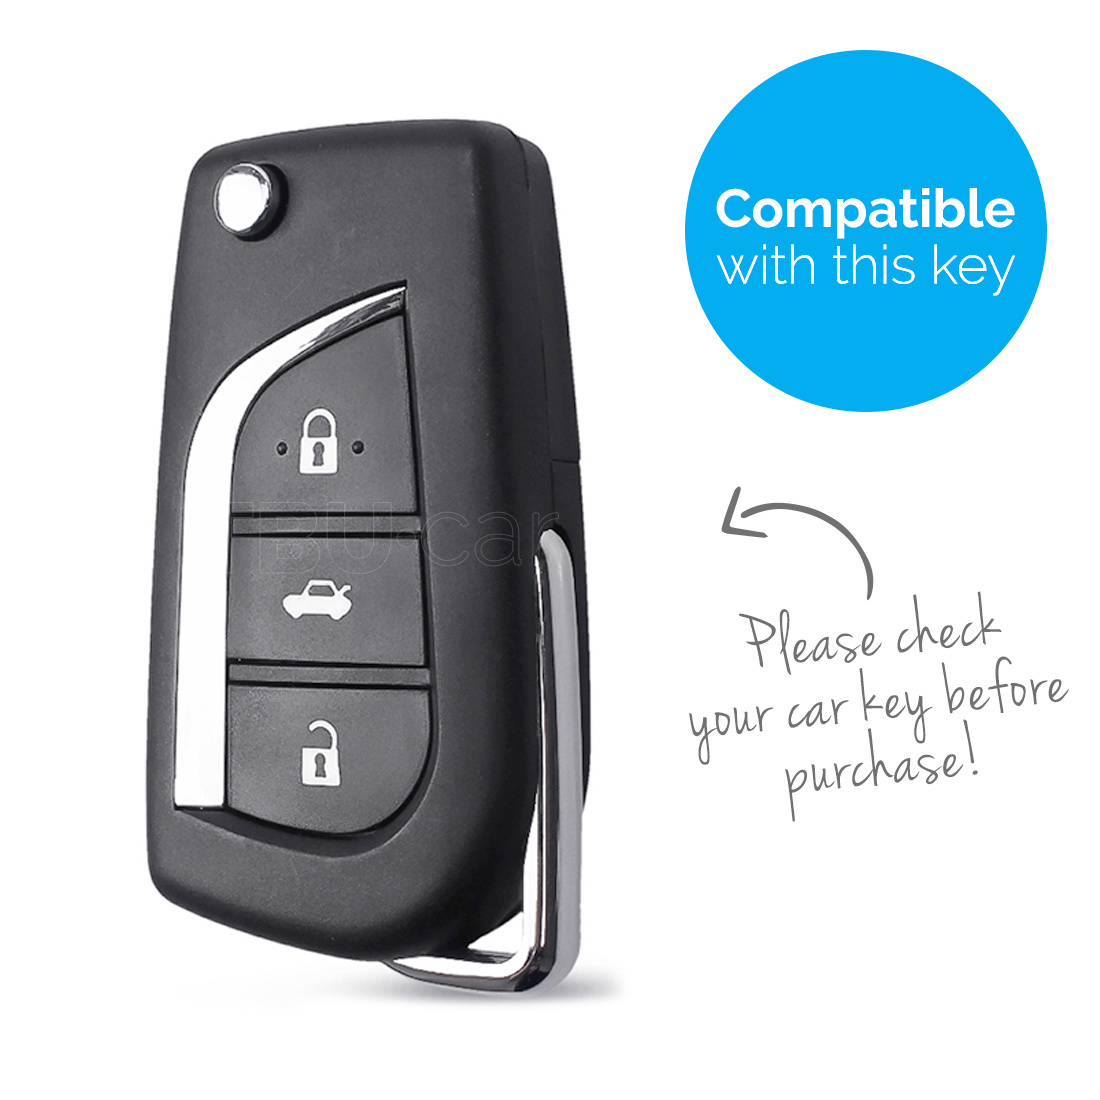 TBU car TBU car Autoschlüssel Hülle kompatibel mit Toyota 3 Tasten - Schutzhülle aus Silikon - Auto Schlüsselhülle Cover in Schwarz